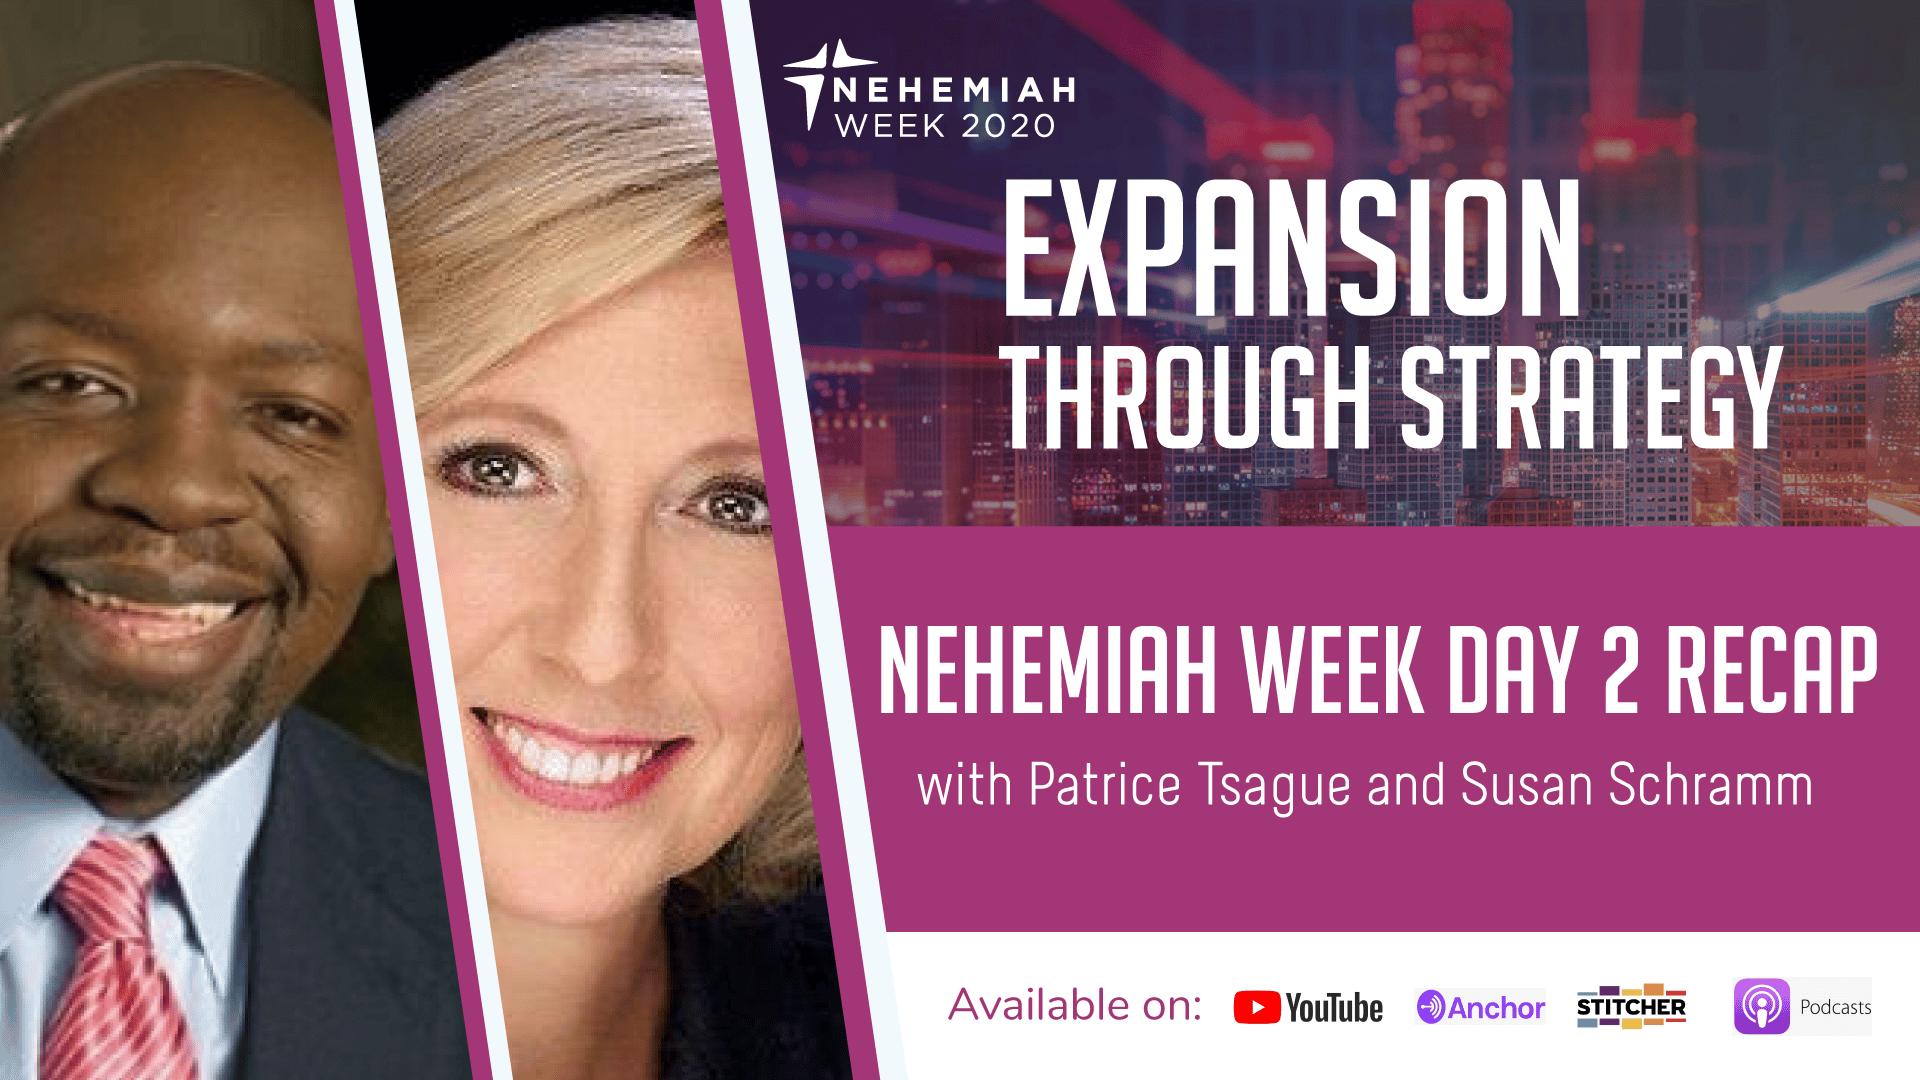 Nehemiah week Day 2 Recap